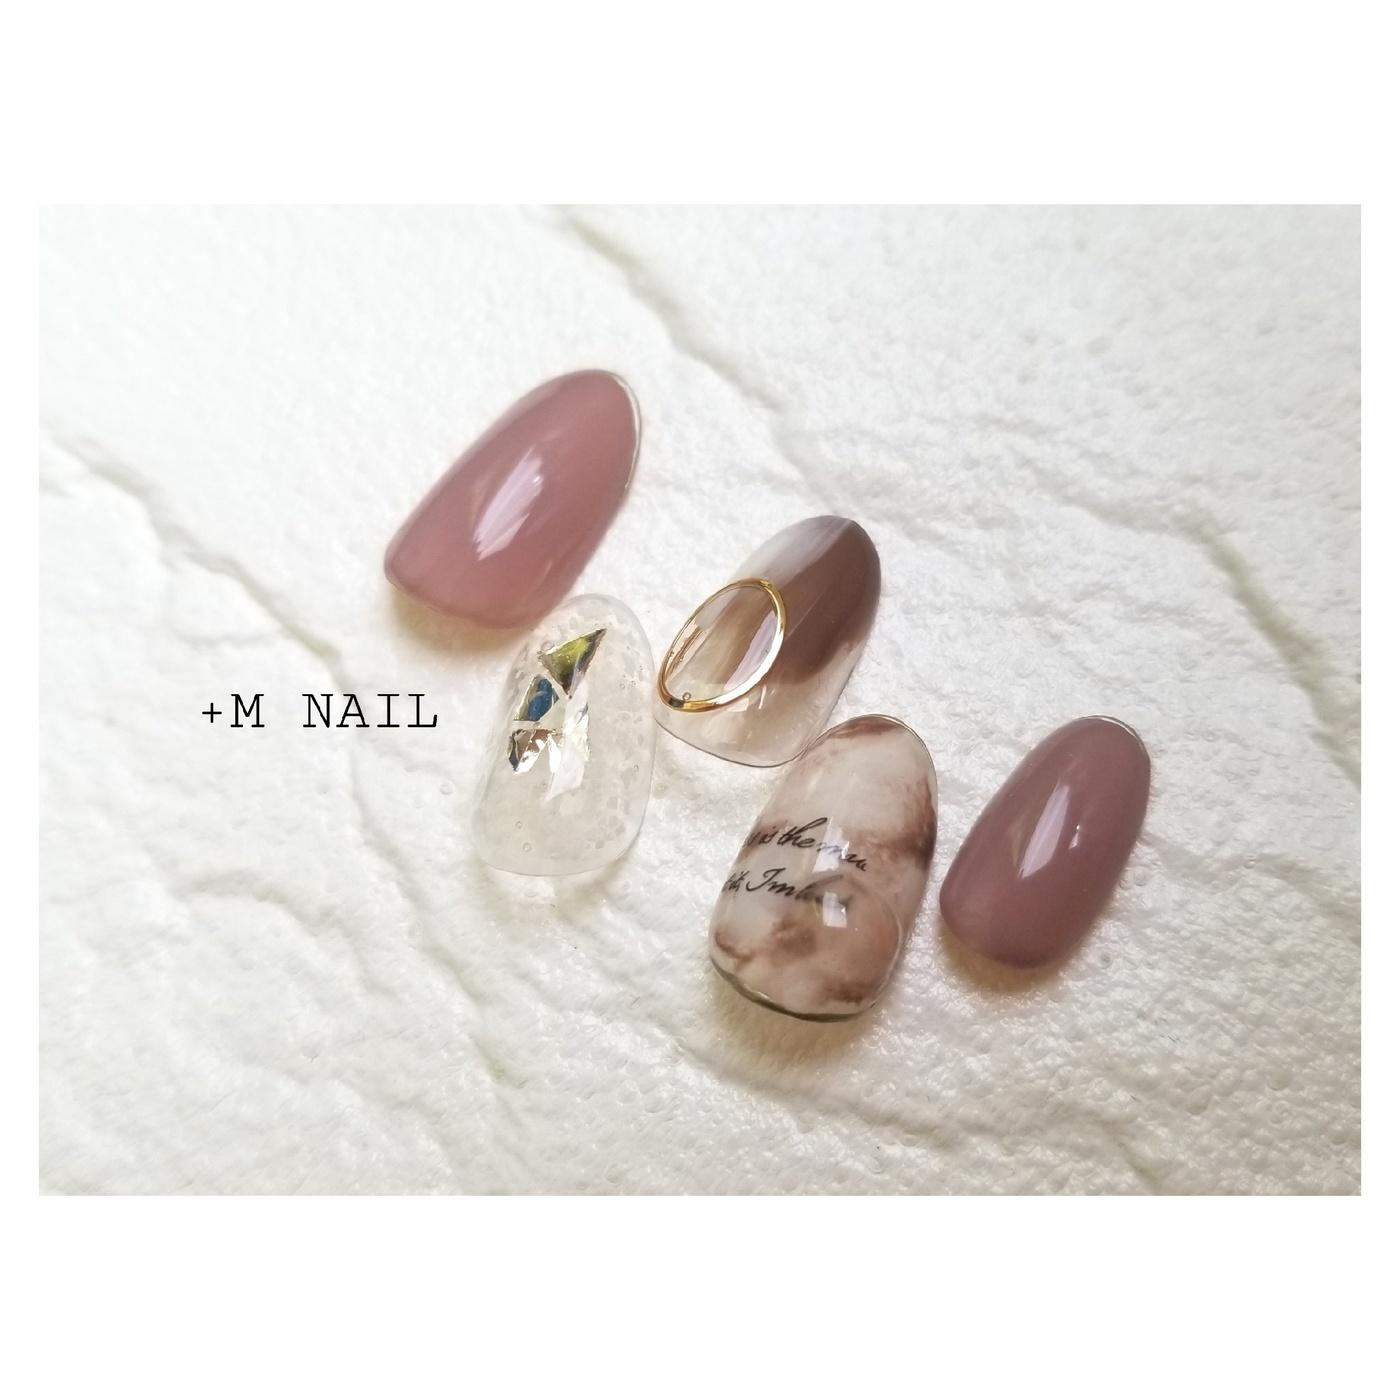 #nails #ジェル #ジェルネイル #ネイル #ネイルサロン #ネイルデザイン #ハンド #大人可愛い #ニュアンスネイル#ホログラムネイル #くすみカラー